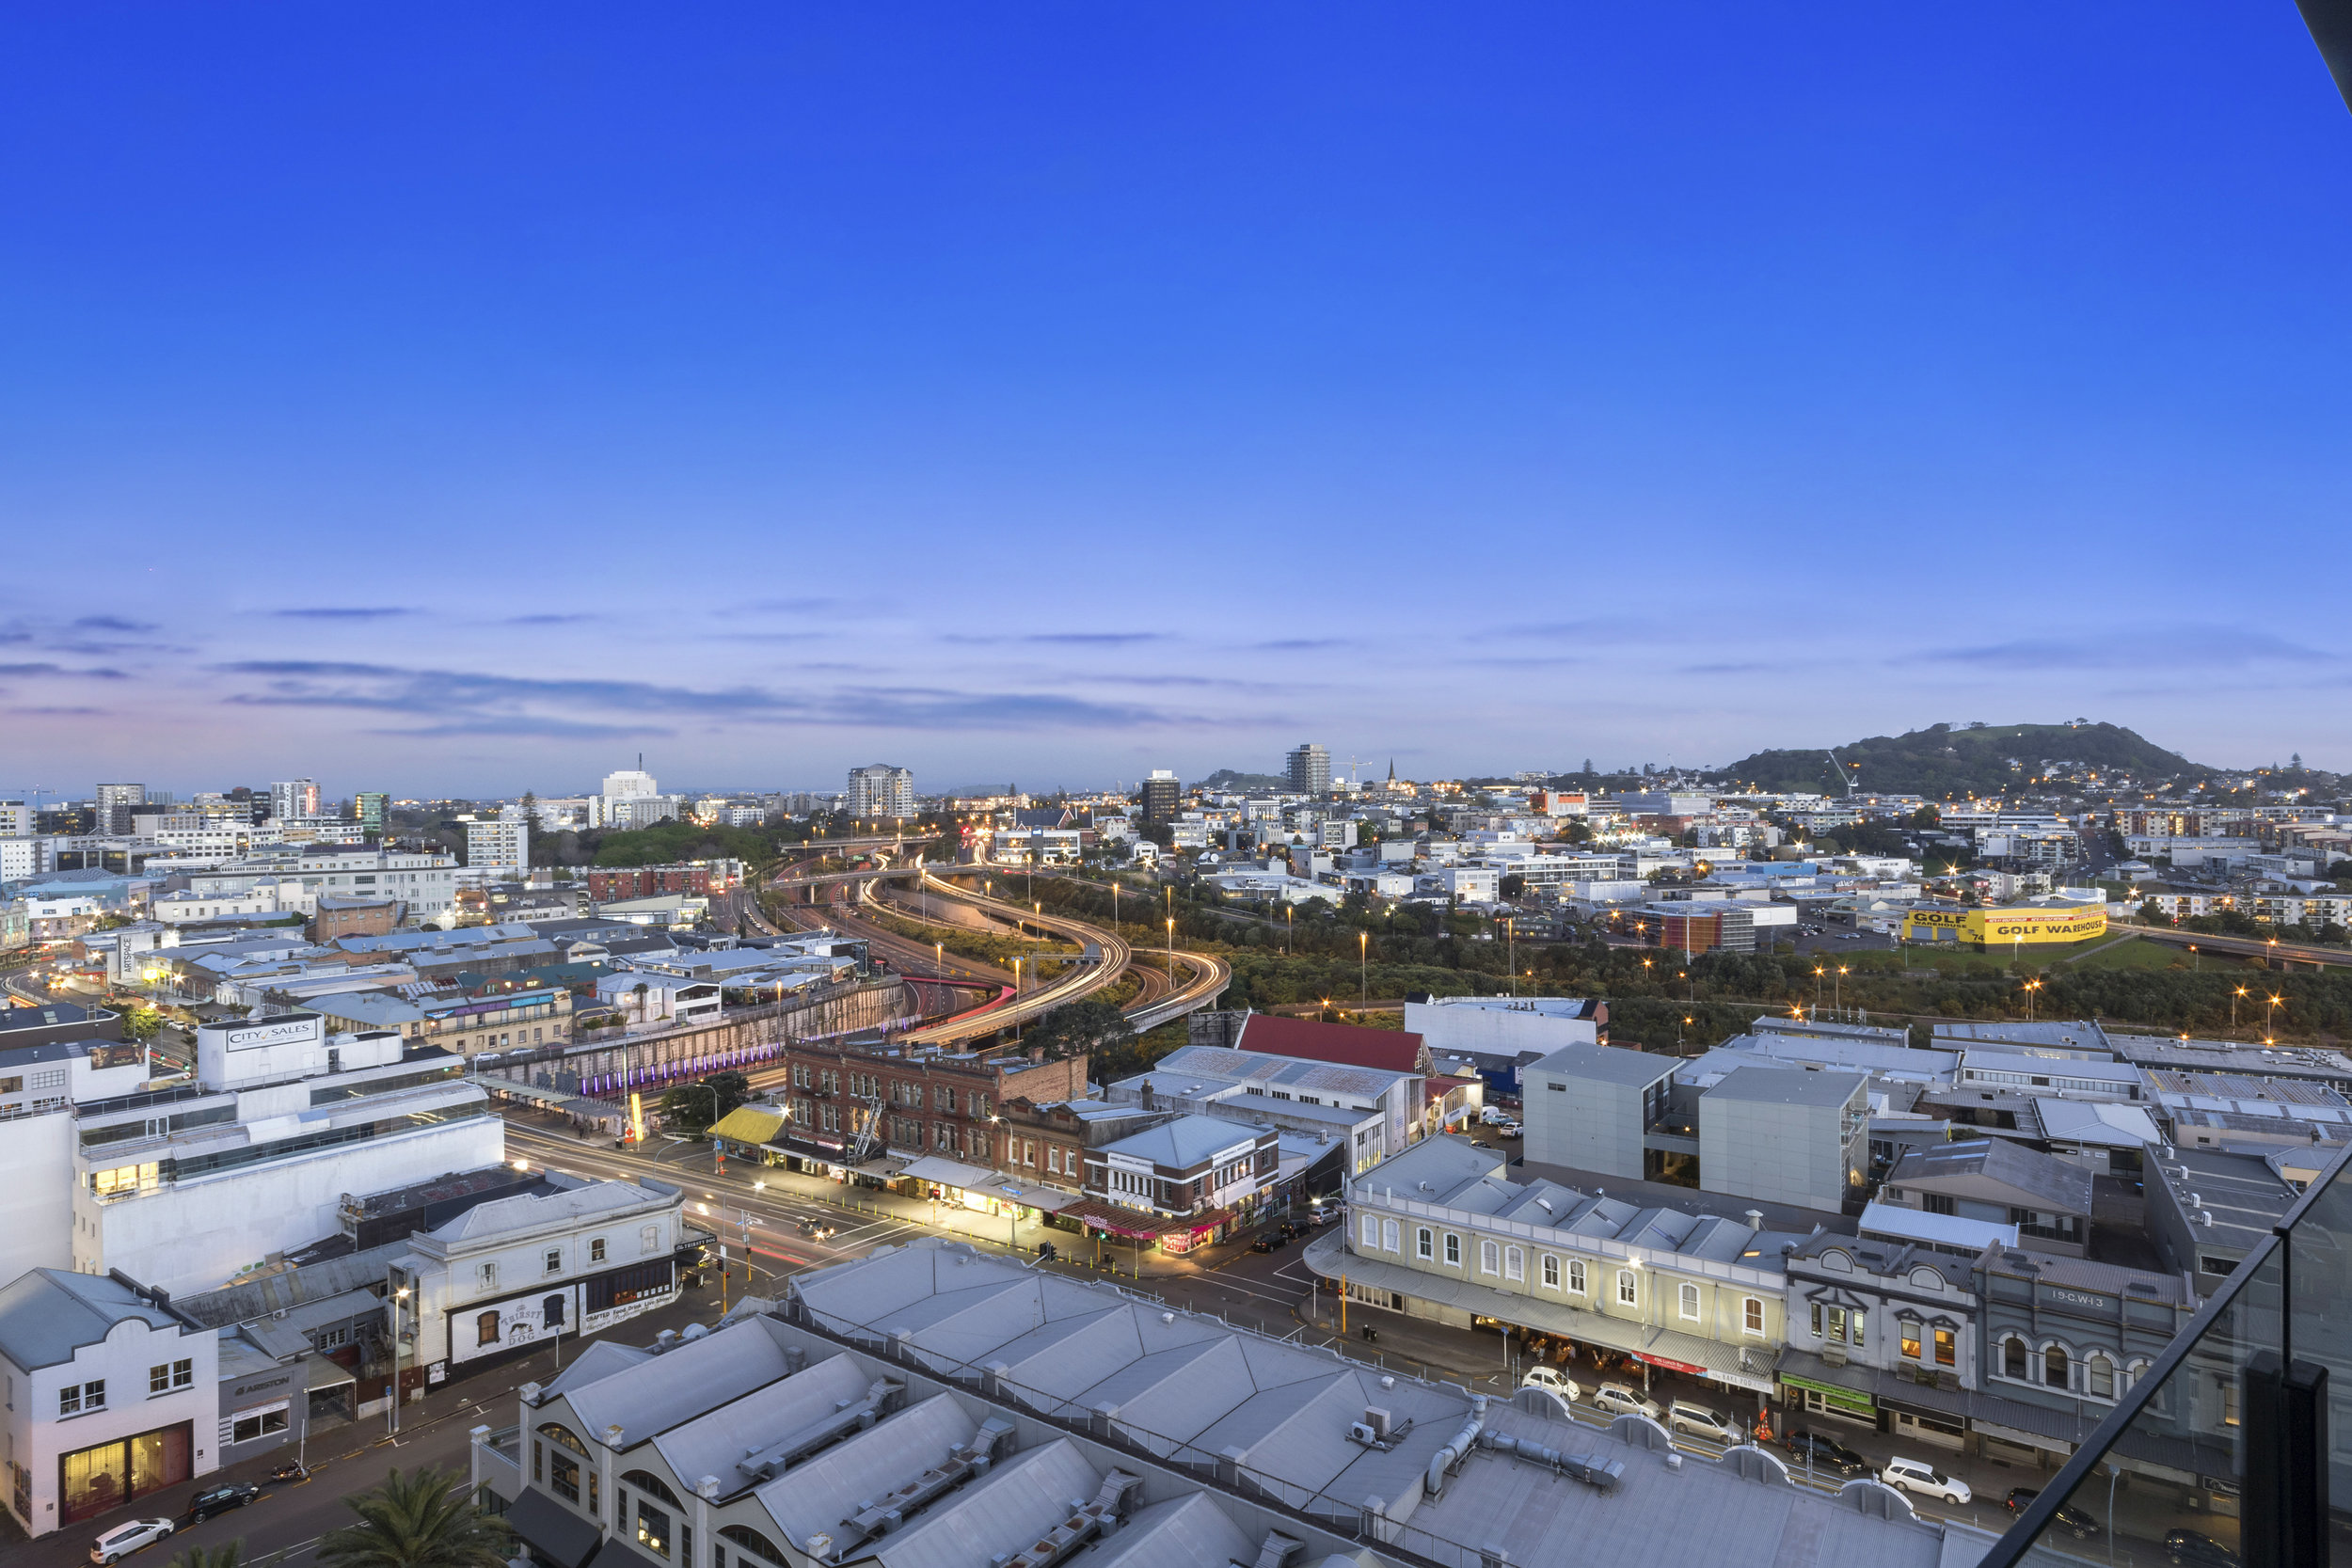 Hereford Street Auckland City 17038-46822-2.jpg